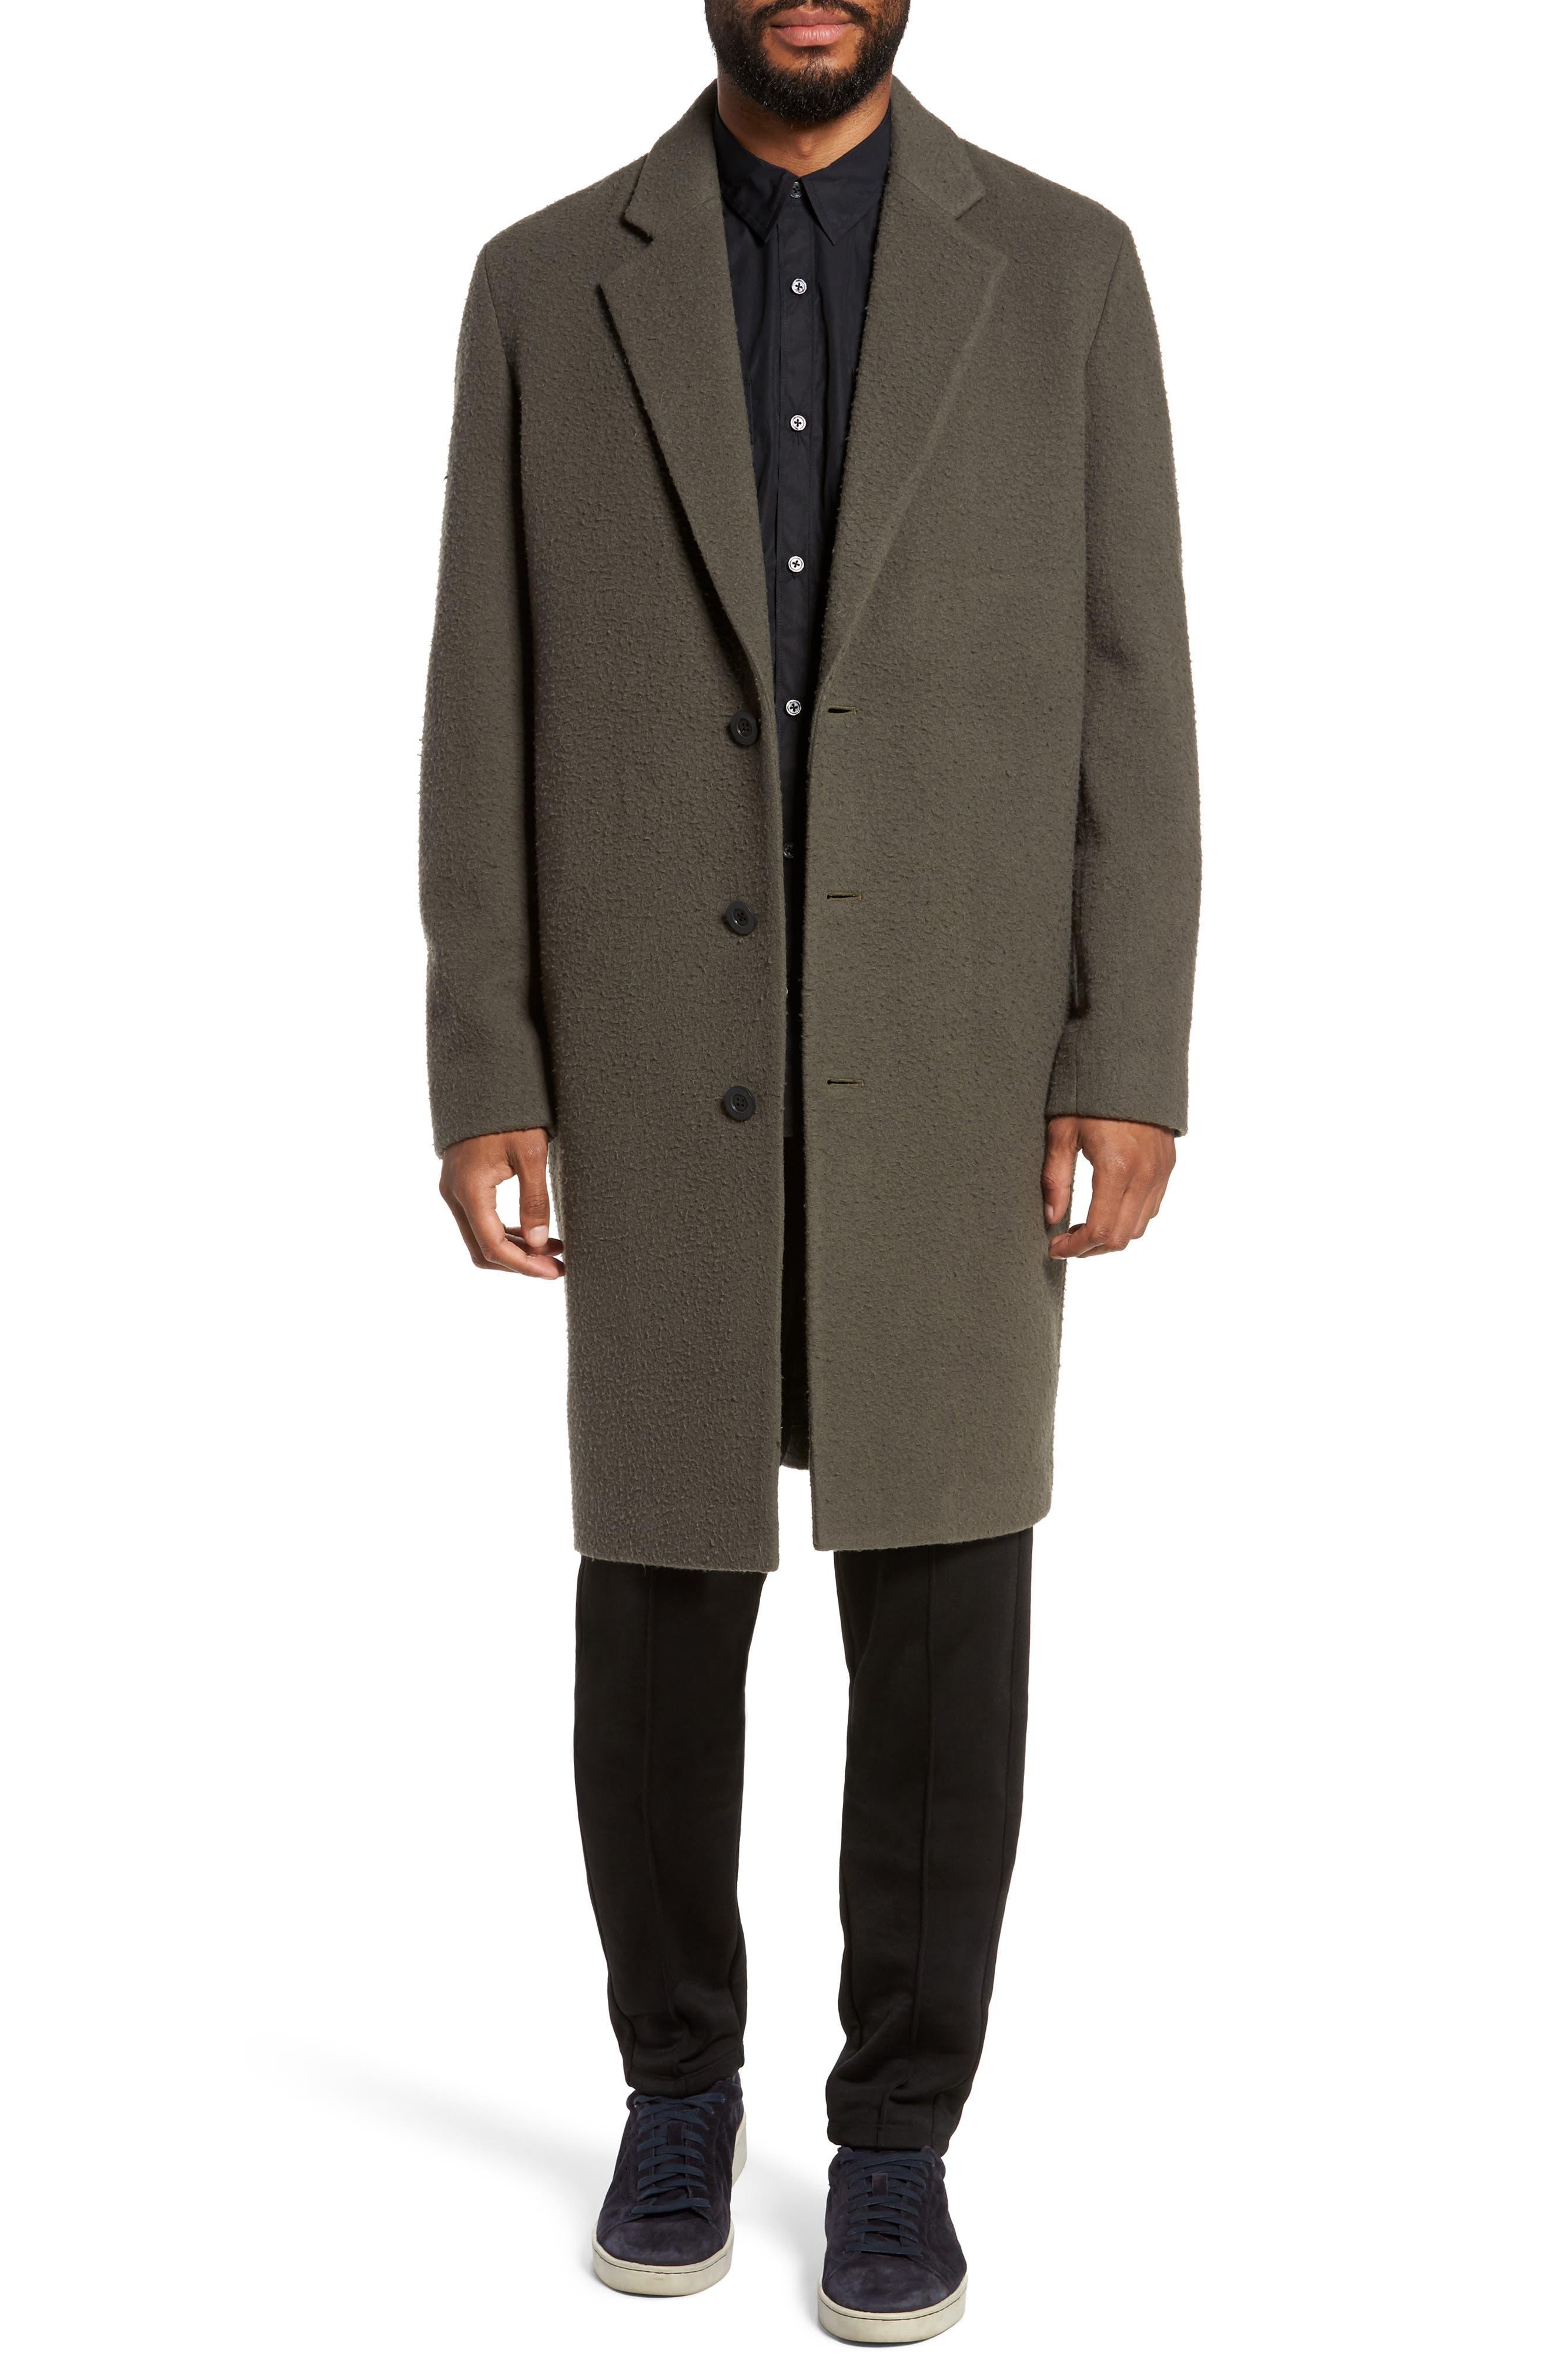 Distressed Wool Blend Car Coat,                             Main thumbnail 1, color,                             310